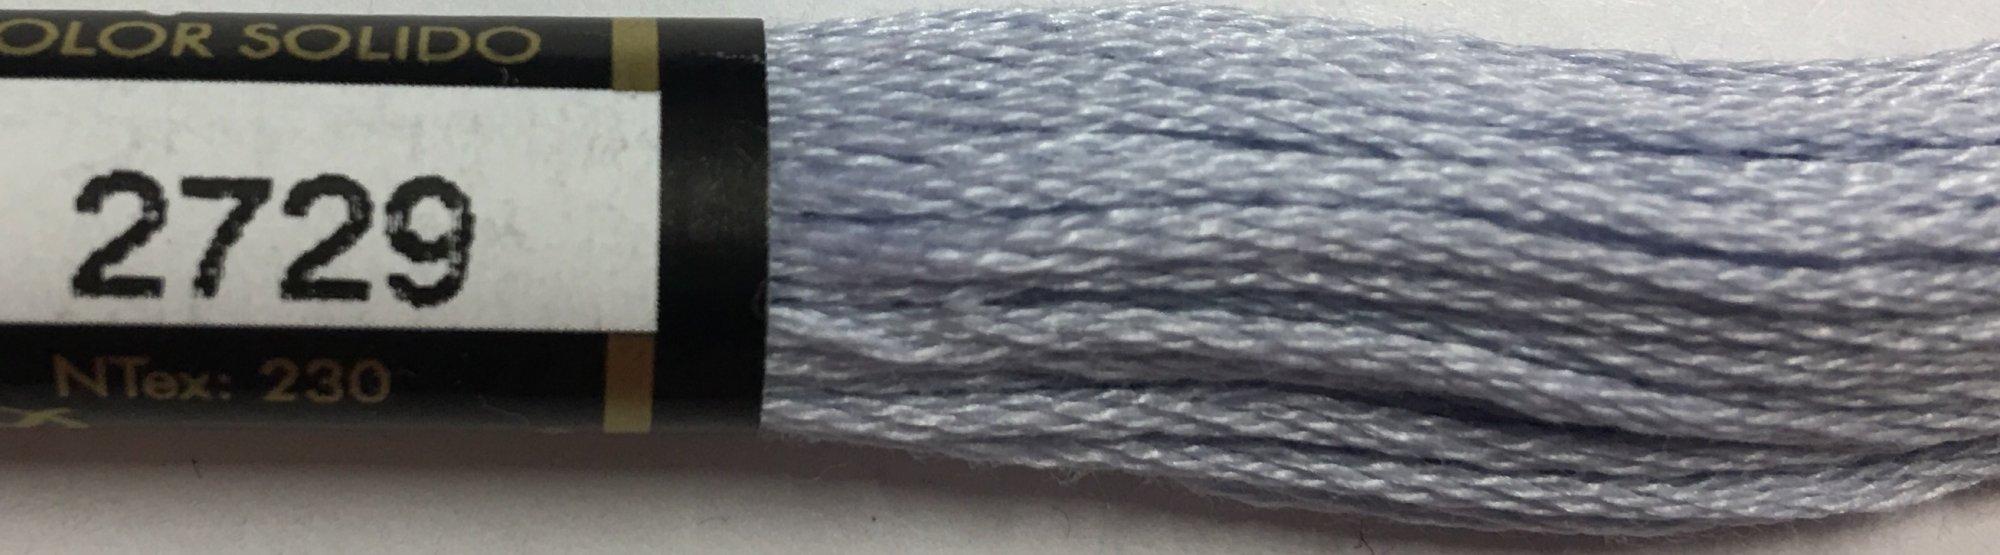 F2729 Presencia 100% Mercerized Finca Cotton 6 ply Embroidery Floss 8 meter skein